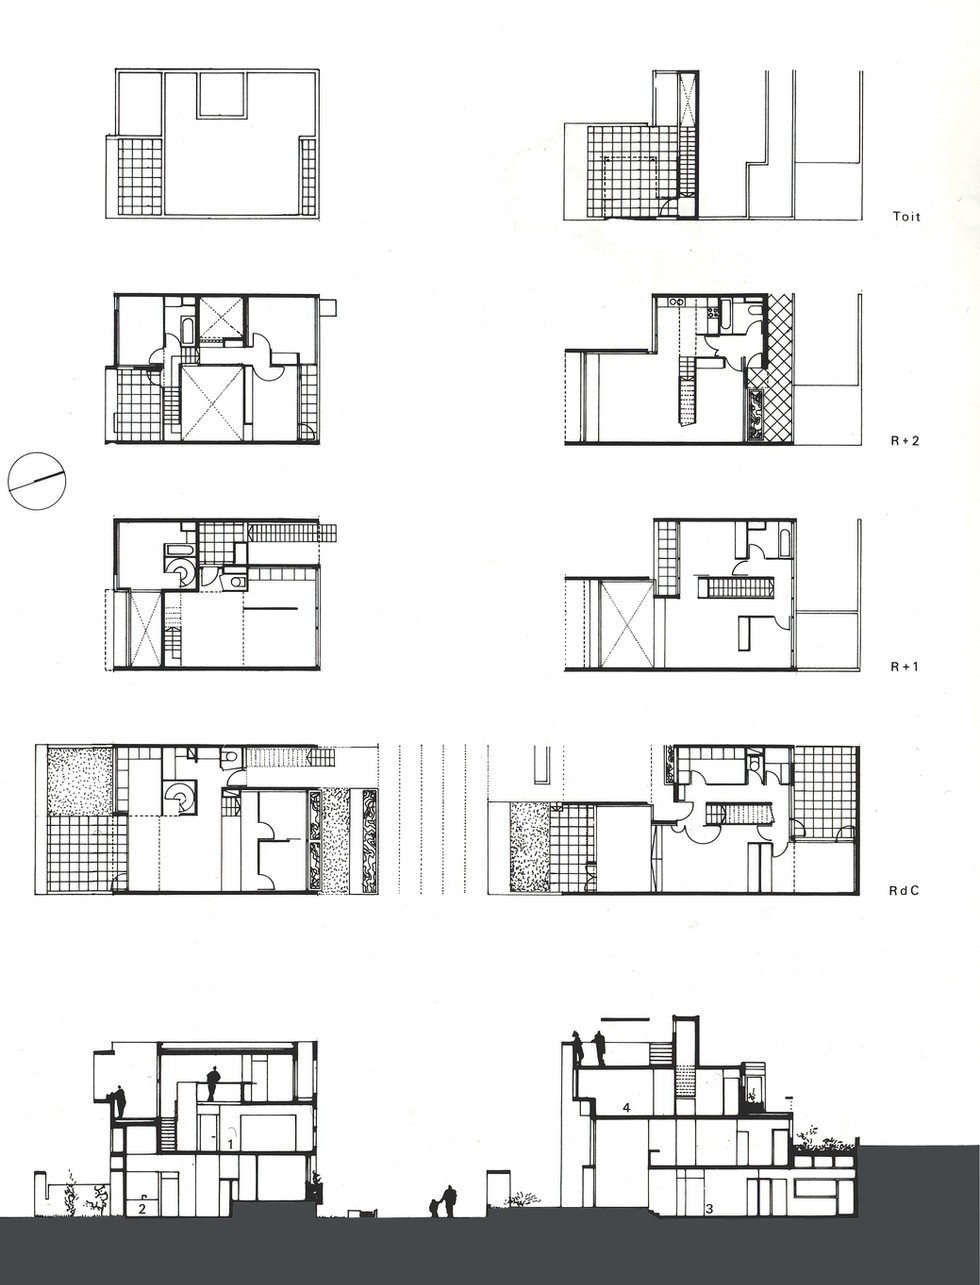 plans coupe maisons3.jpg